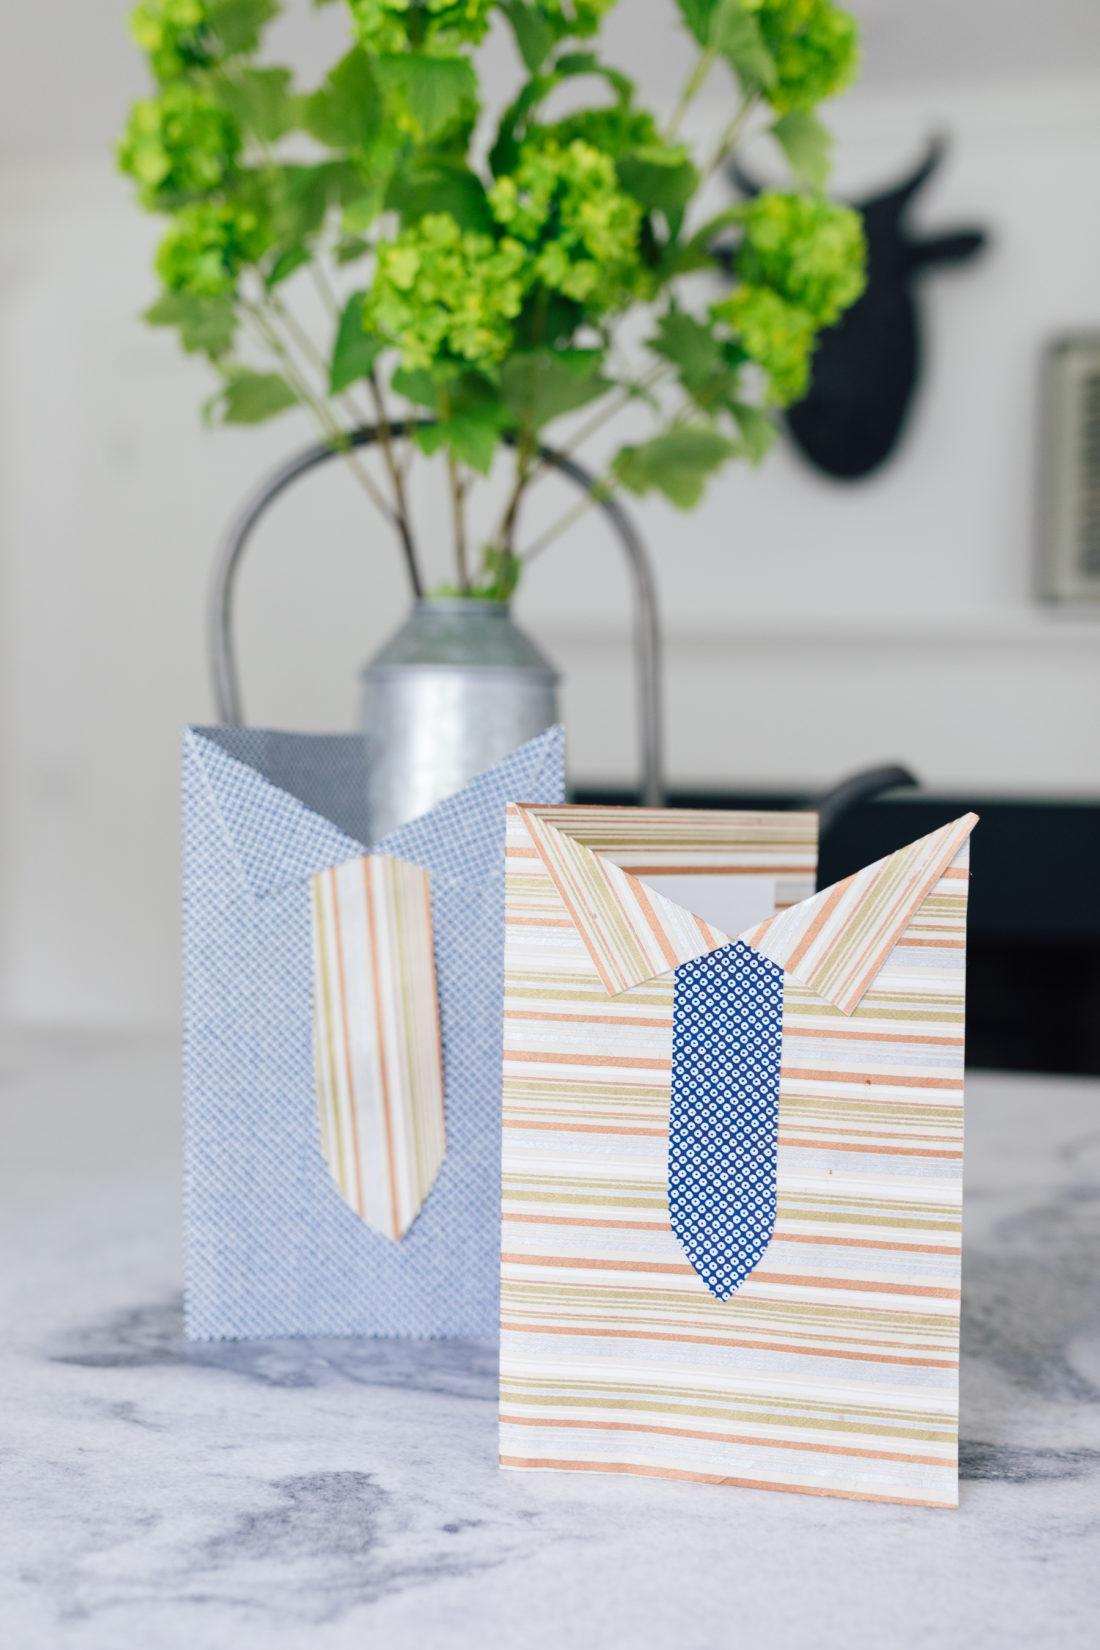 Eva Amurri Martino's DIY shirt and tie cards for Father's Day